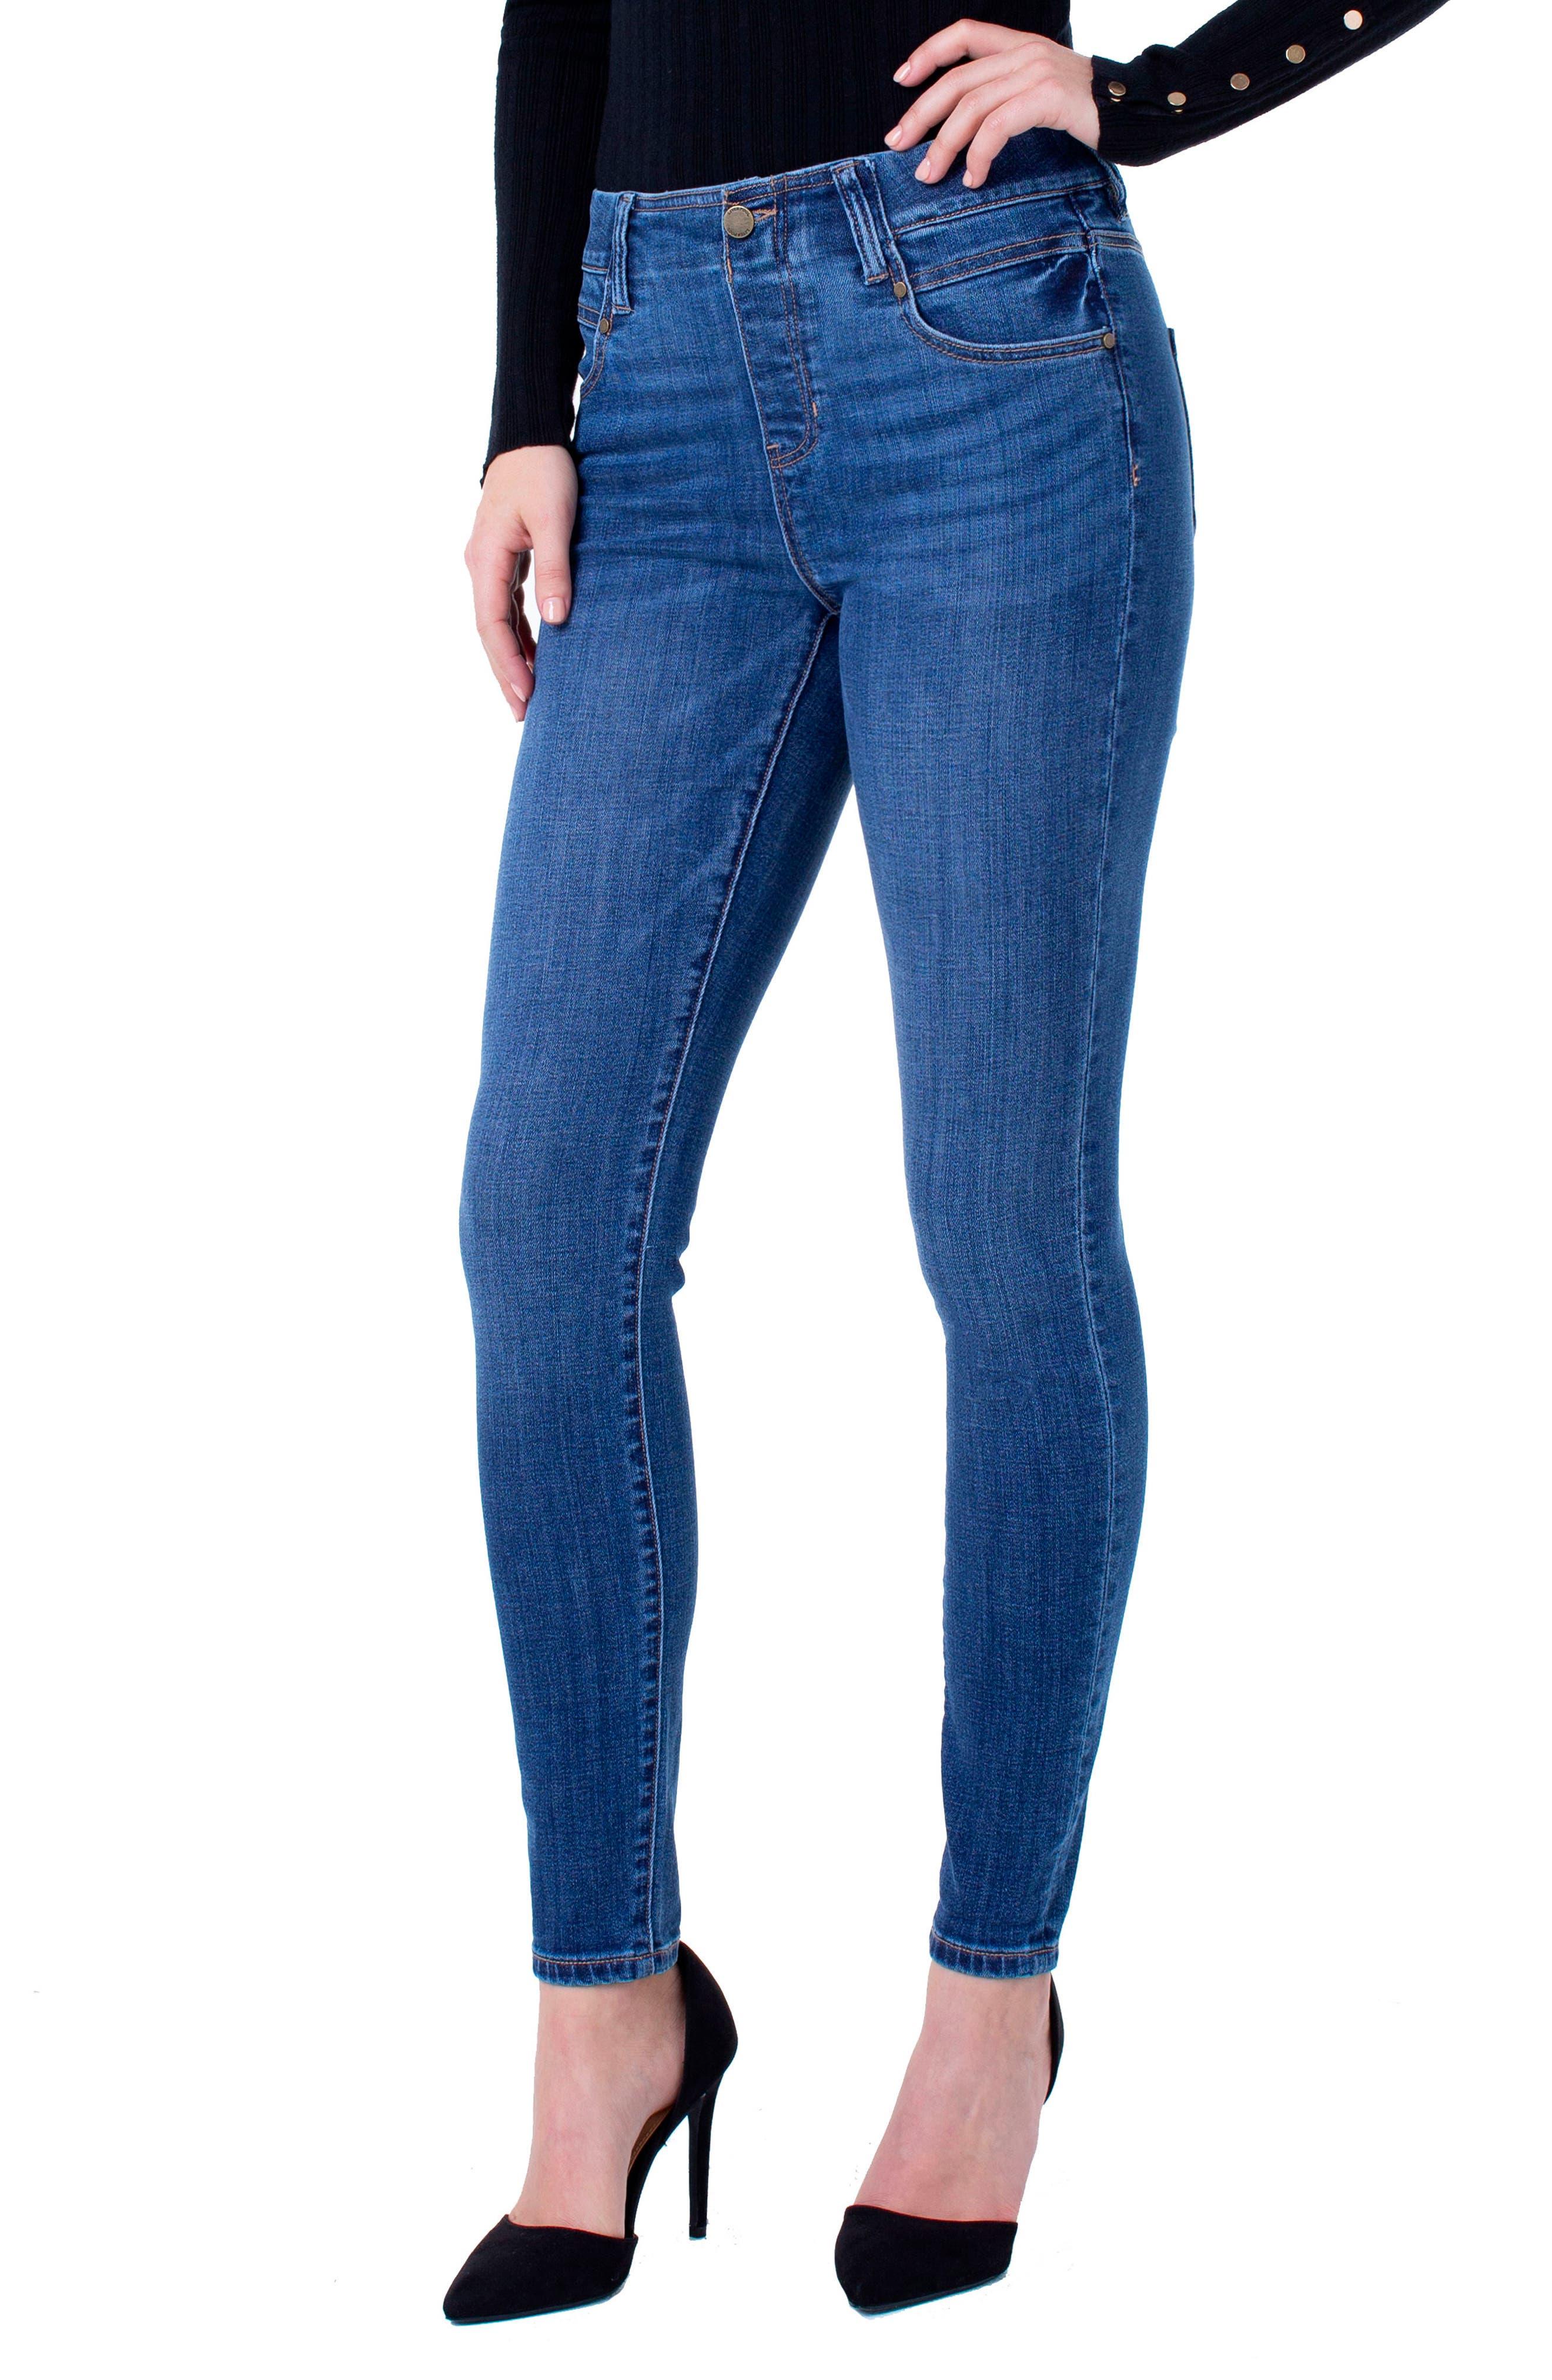 Gia Glider High Waist Skinny Jeans